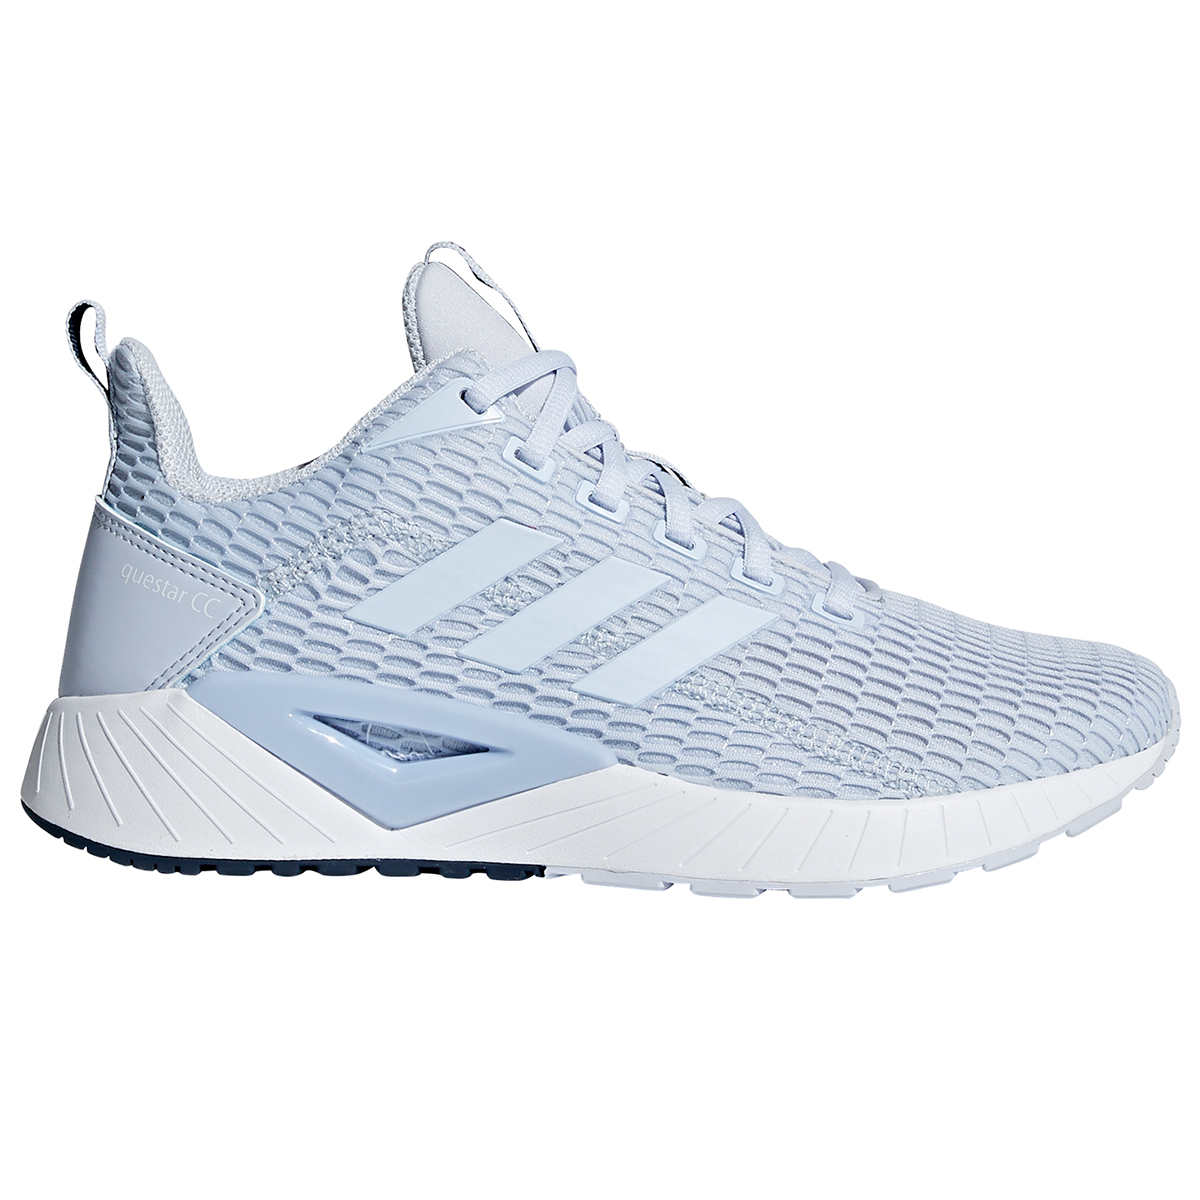 Adidas Women's Questar Cc Running Shoes - Blue, 10